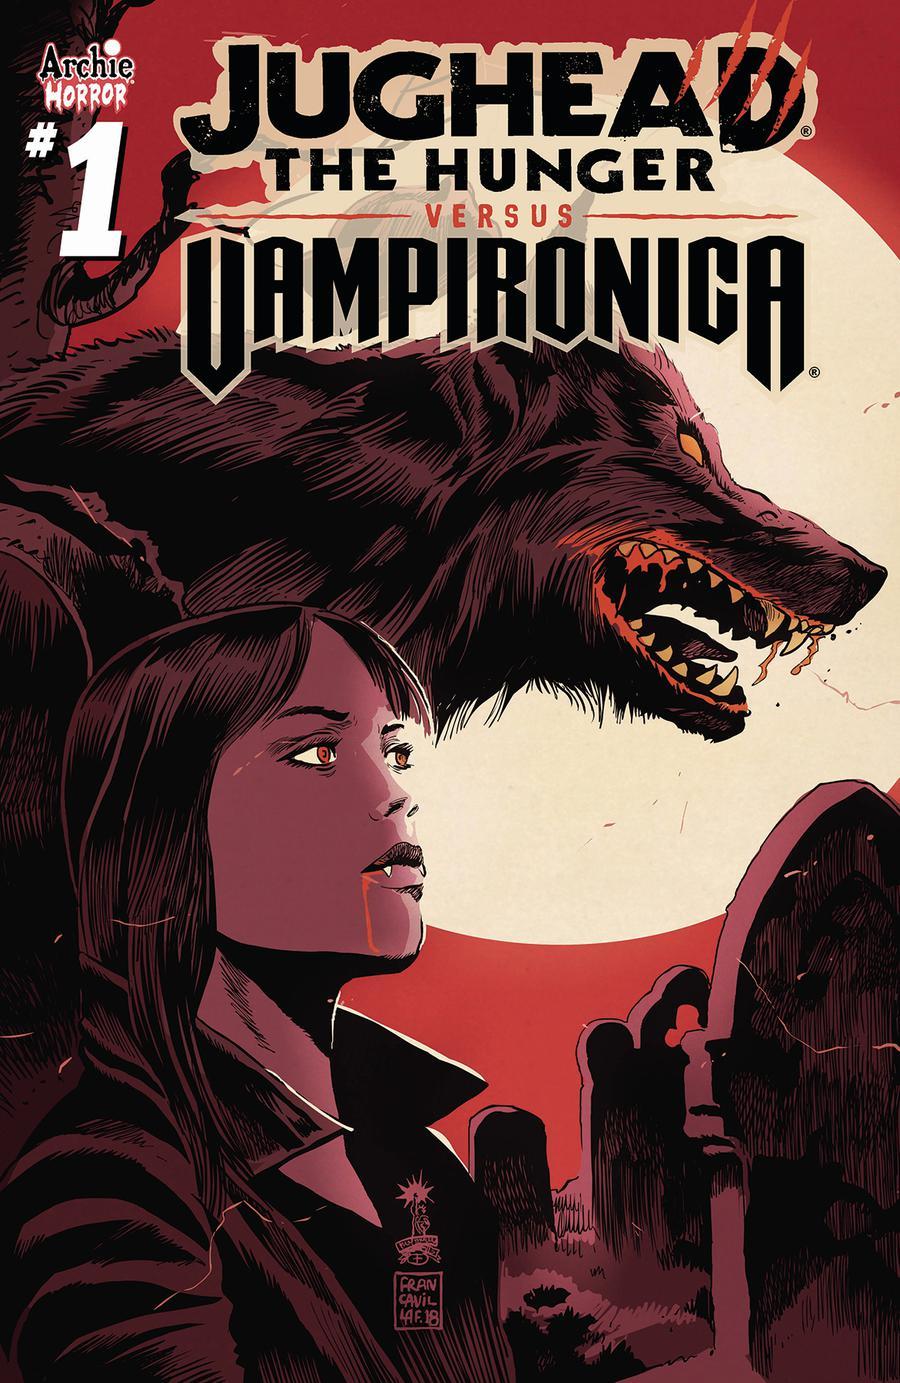 Jughead The Hunger Versus Vampironica #1 Cover B Variant Francesco Francavilla Cover